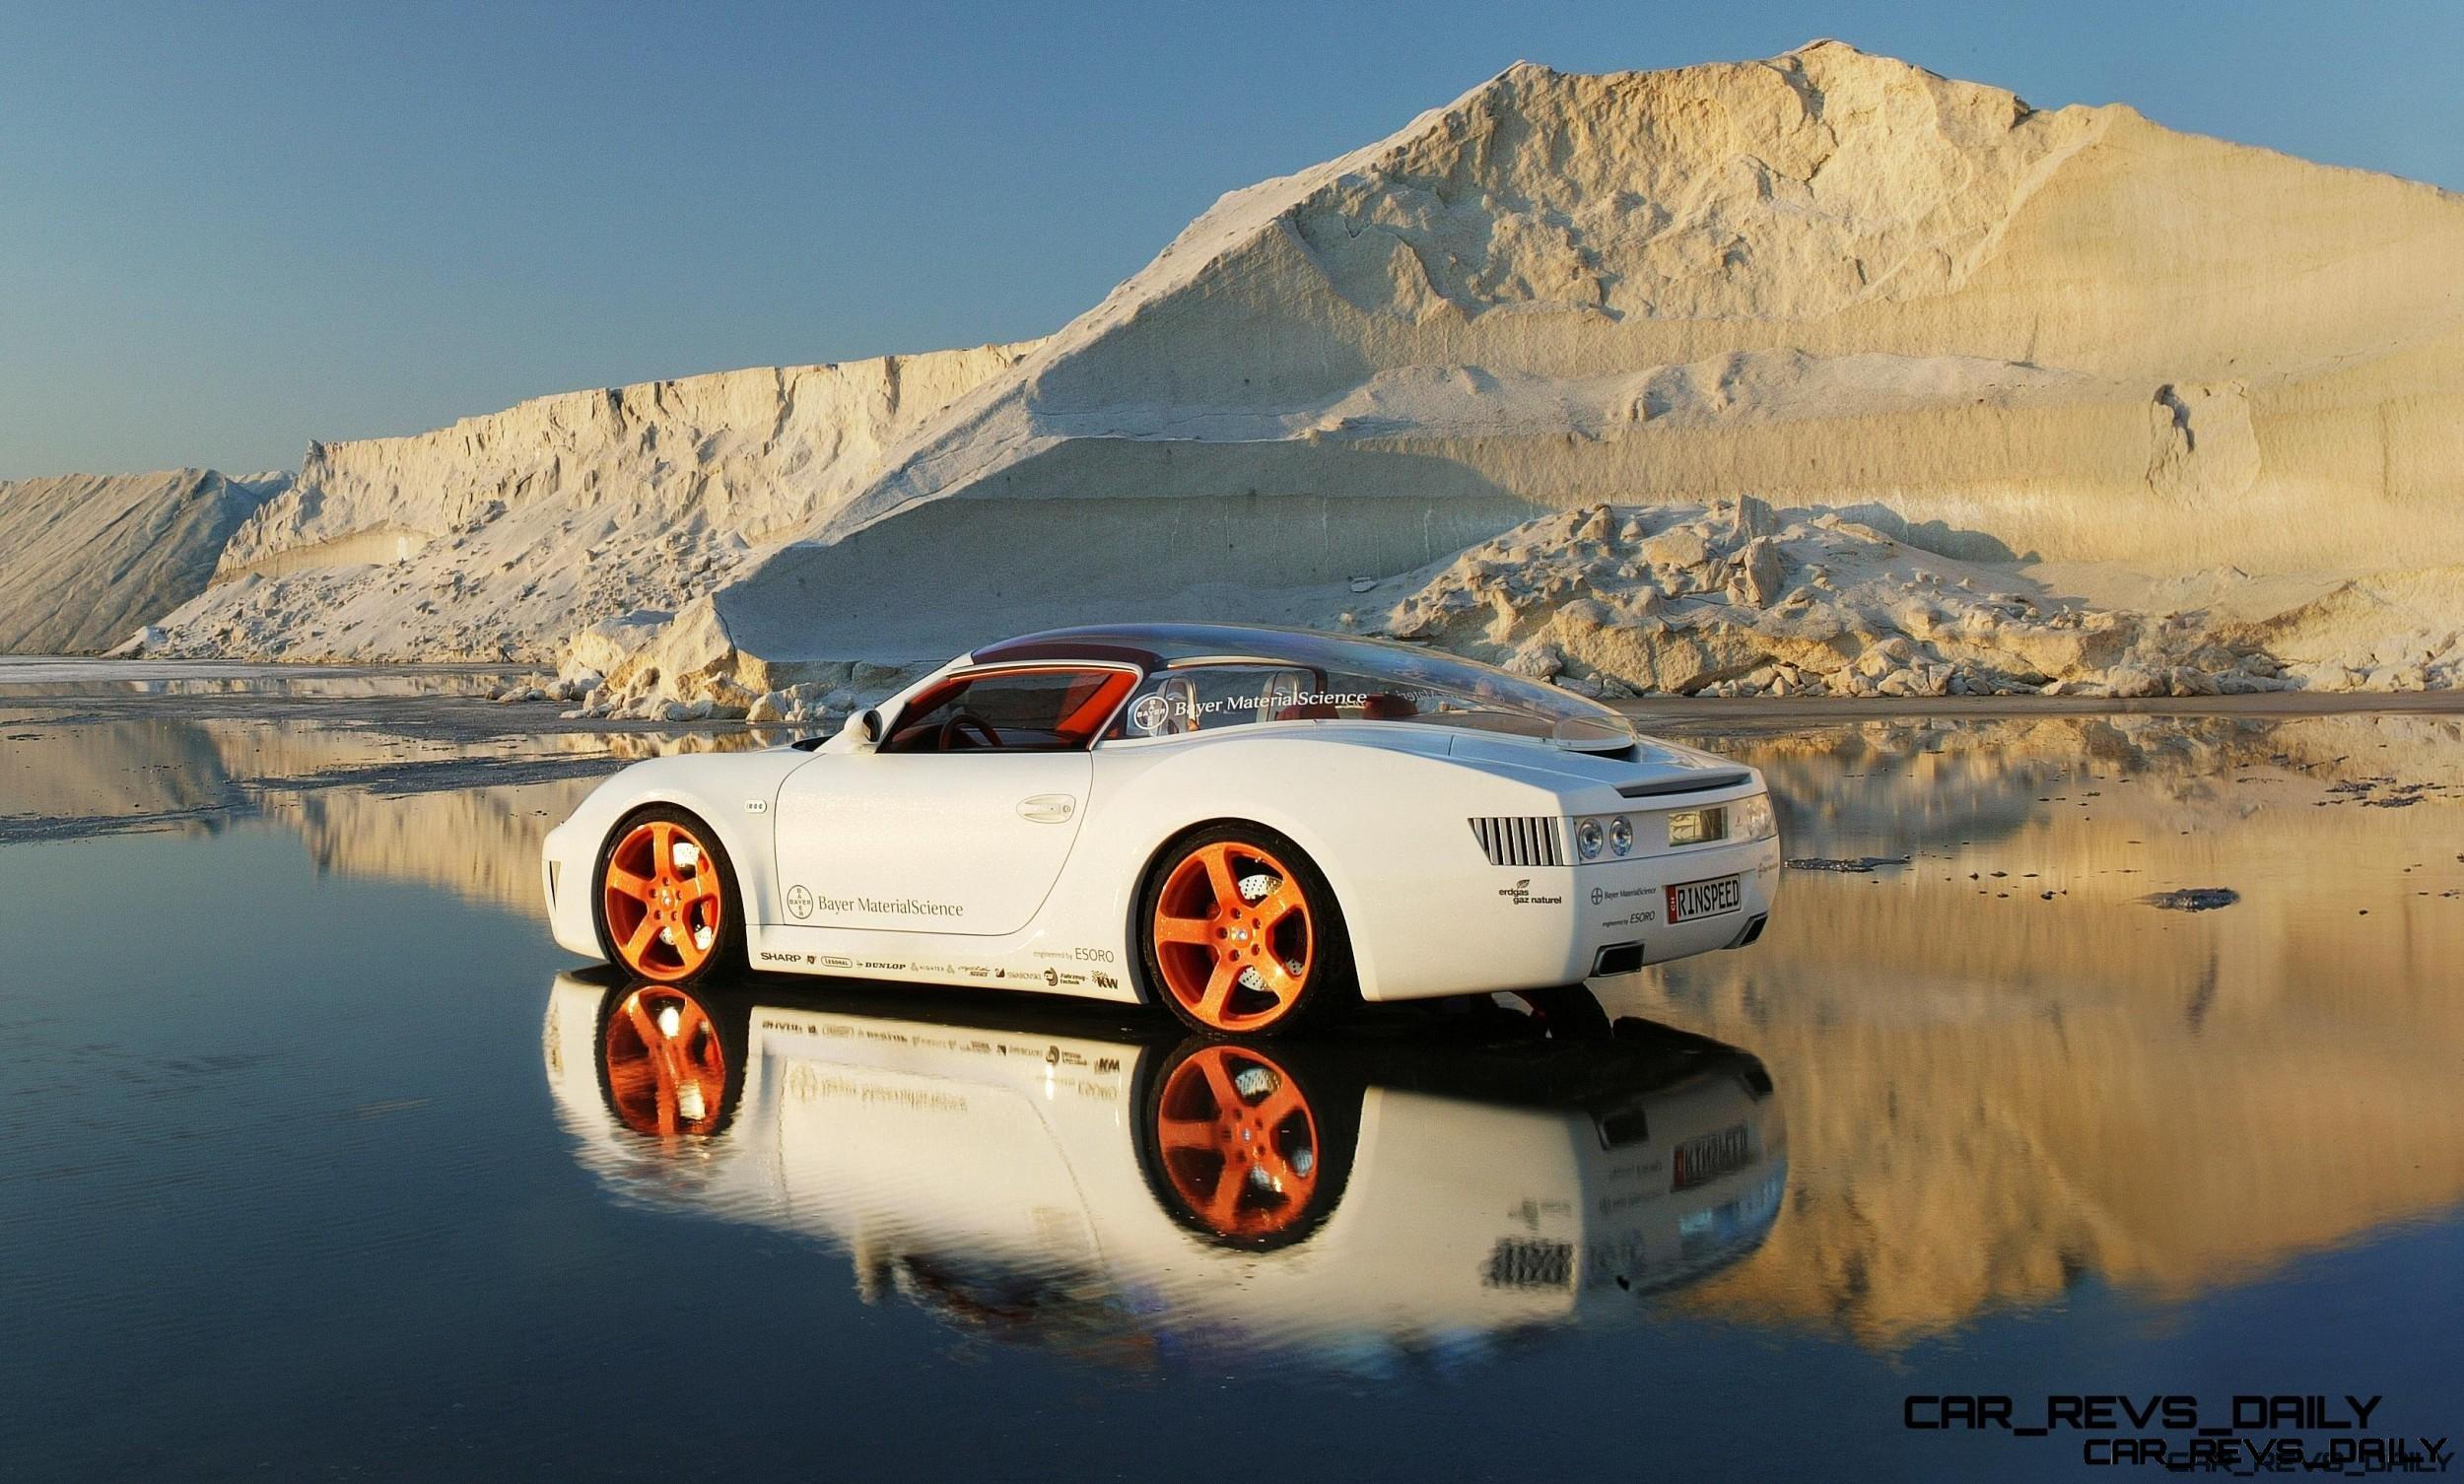 Concept Flashback - 2006 RINSPEED ZaZen is Porsche 911 with Clear Bubble Hardtop 54